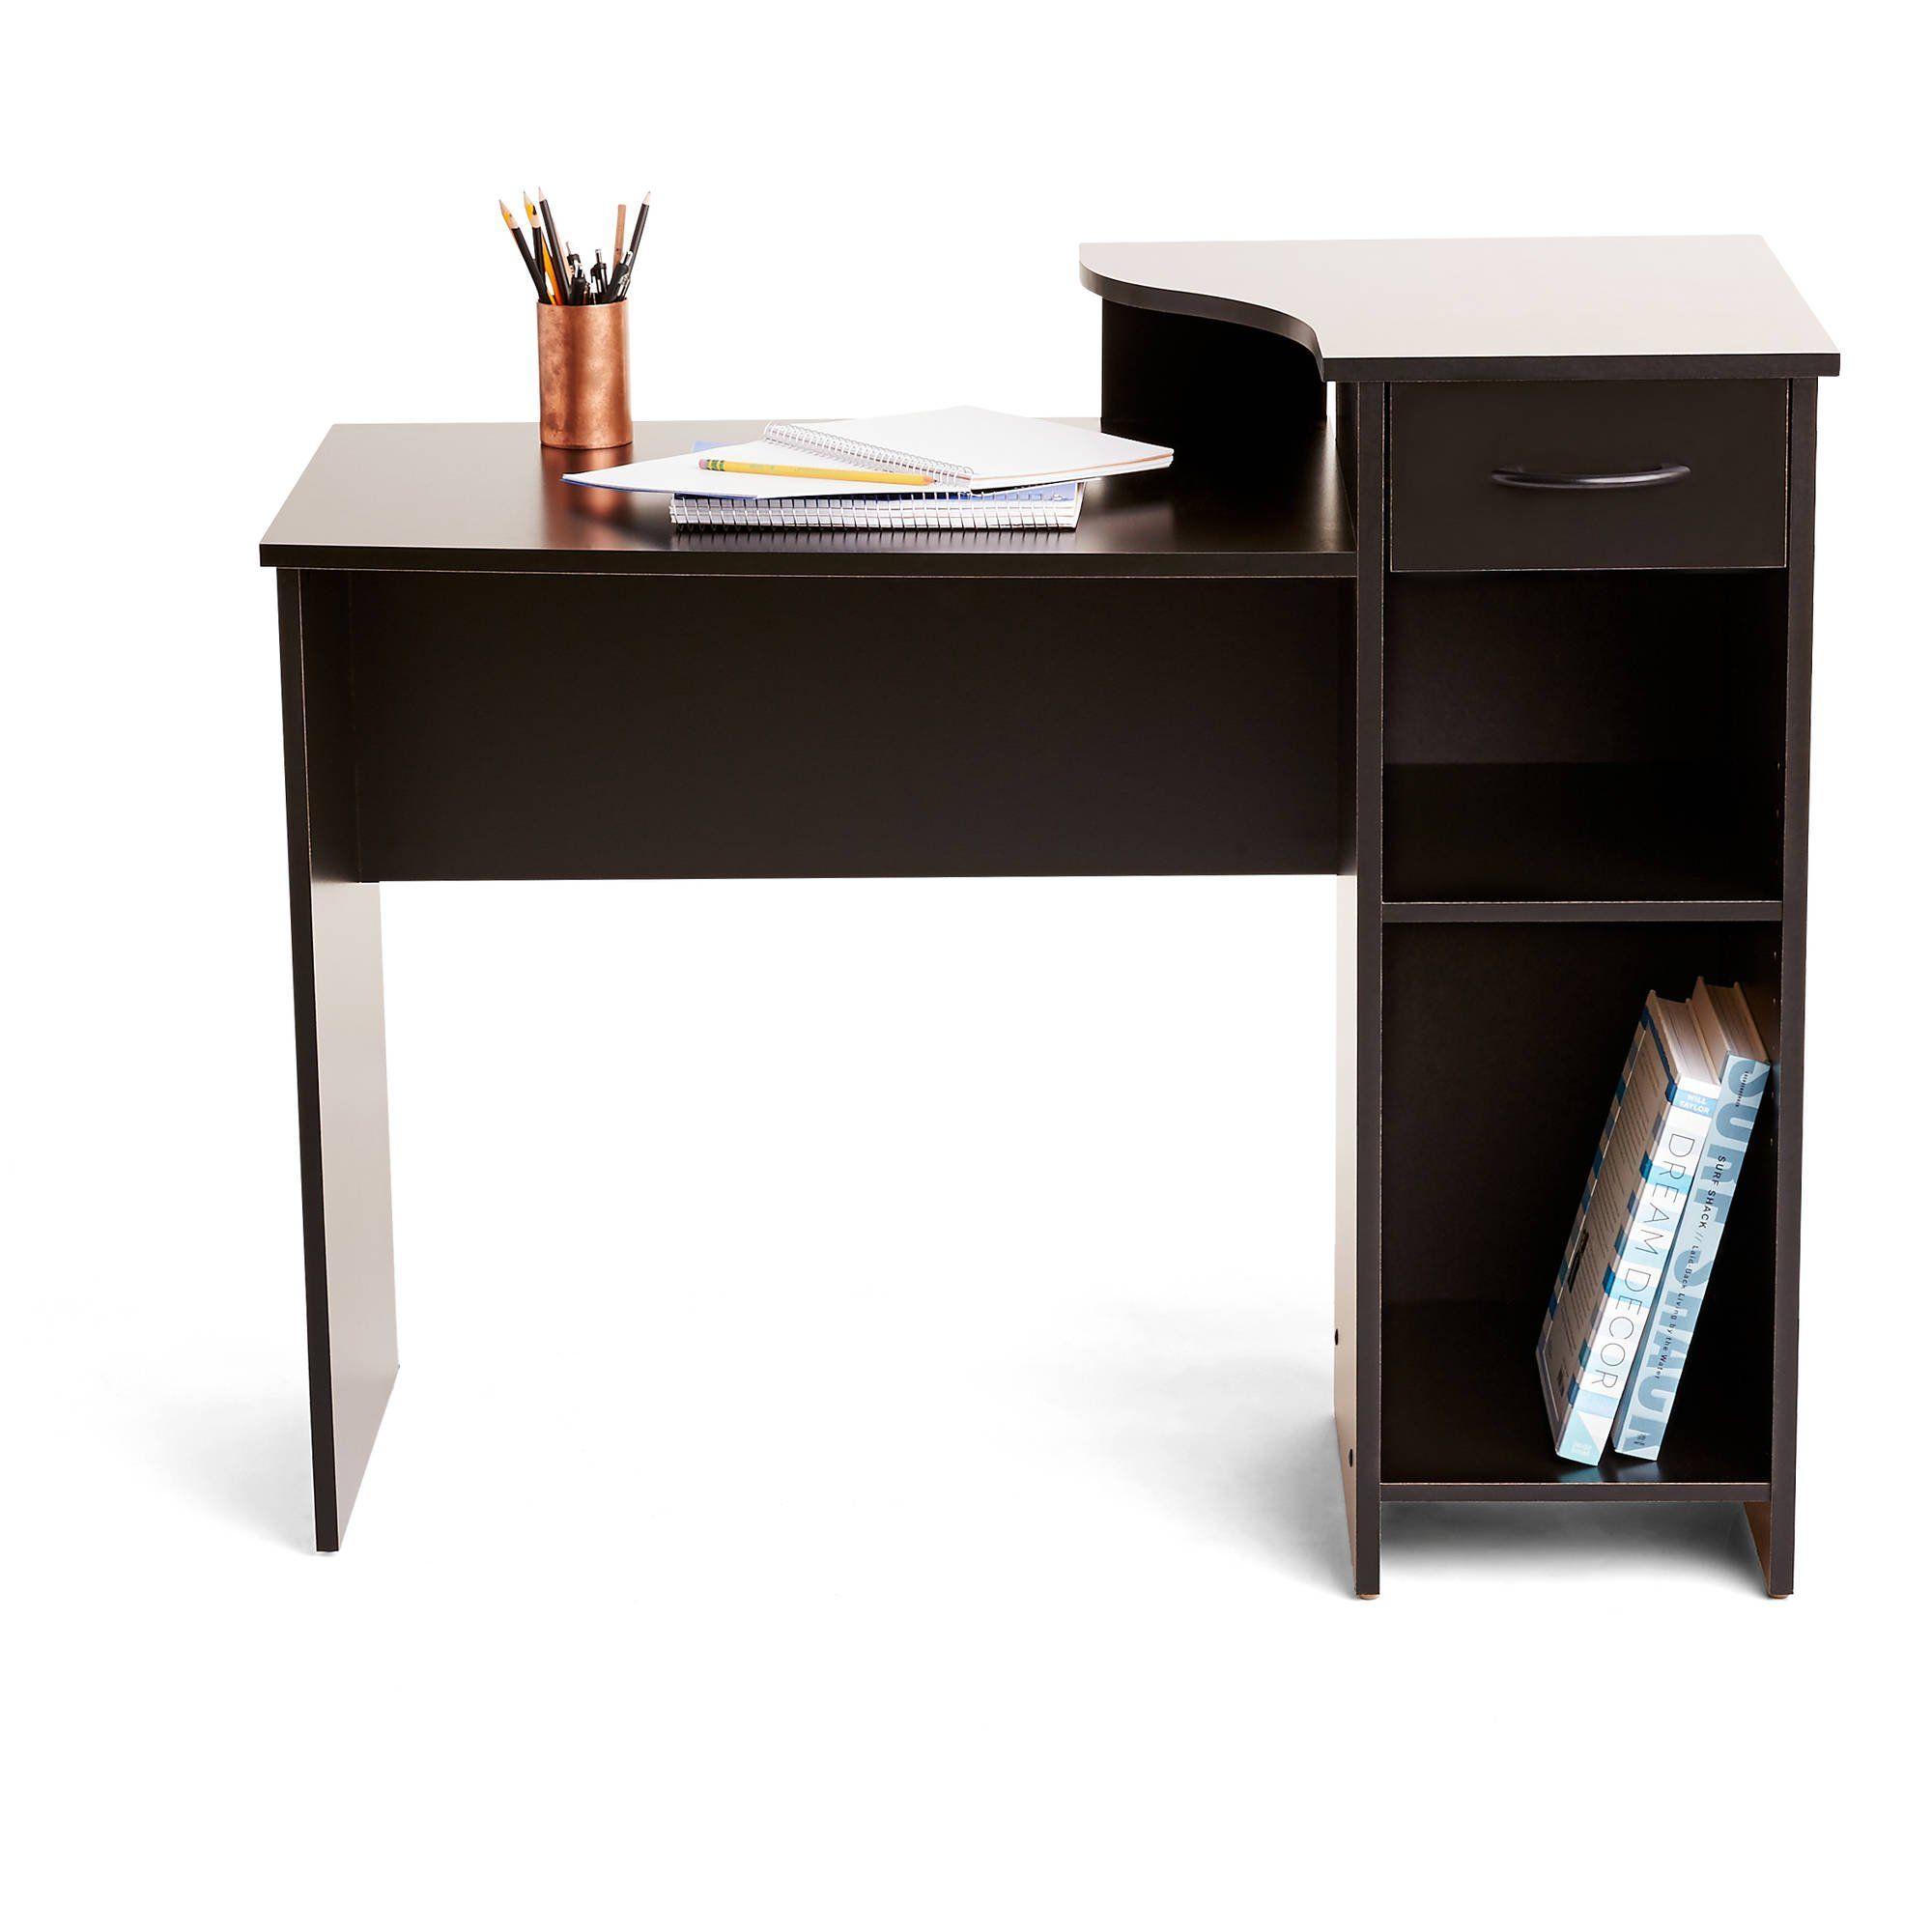 Mainstays Student Desk With Easy Glide Drawer Blackwood Finish Walmart Com In 2020 Desk Desk With Drawers Easy Glide Drawers